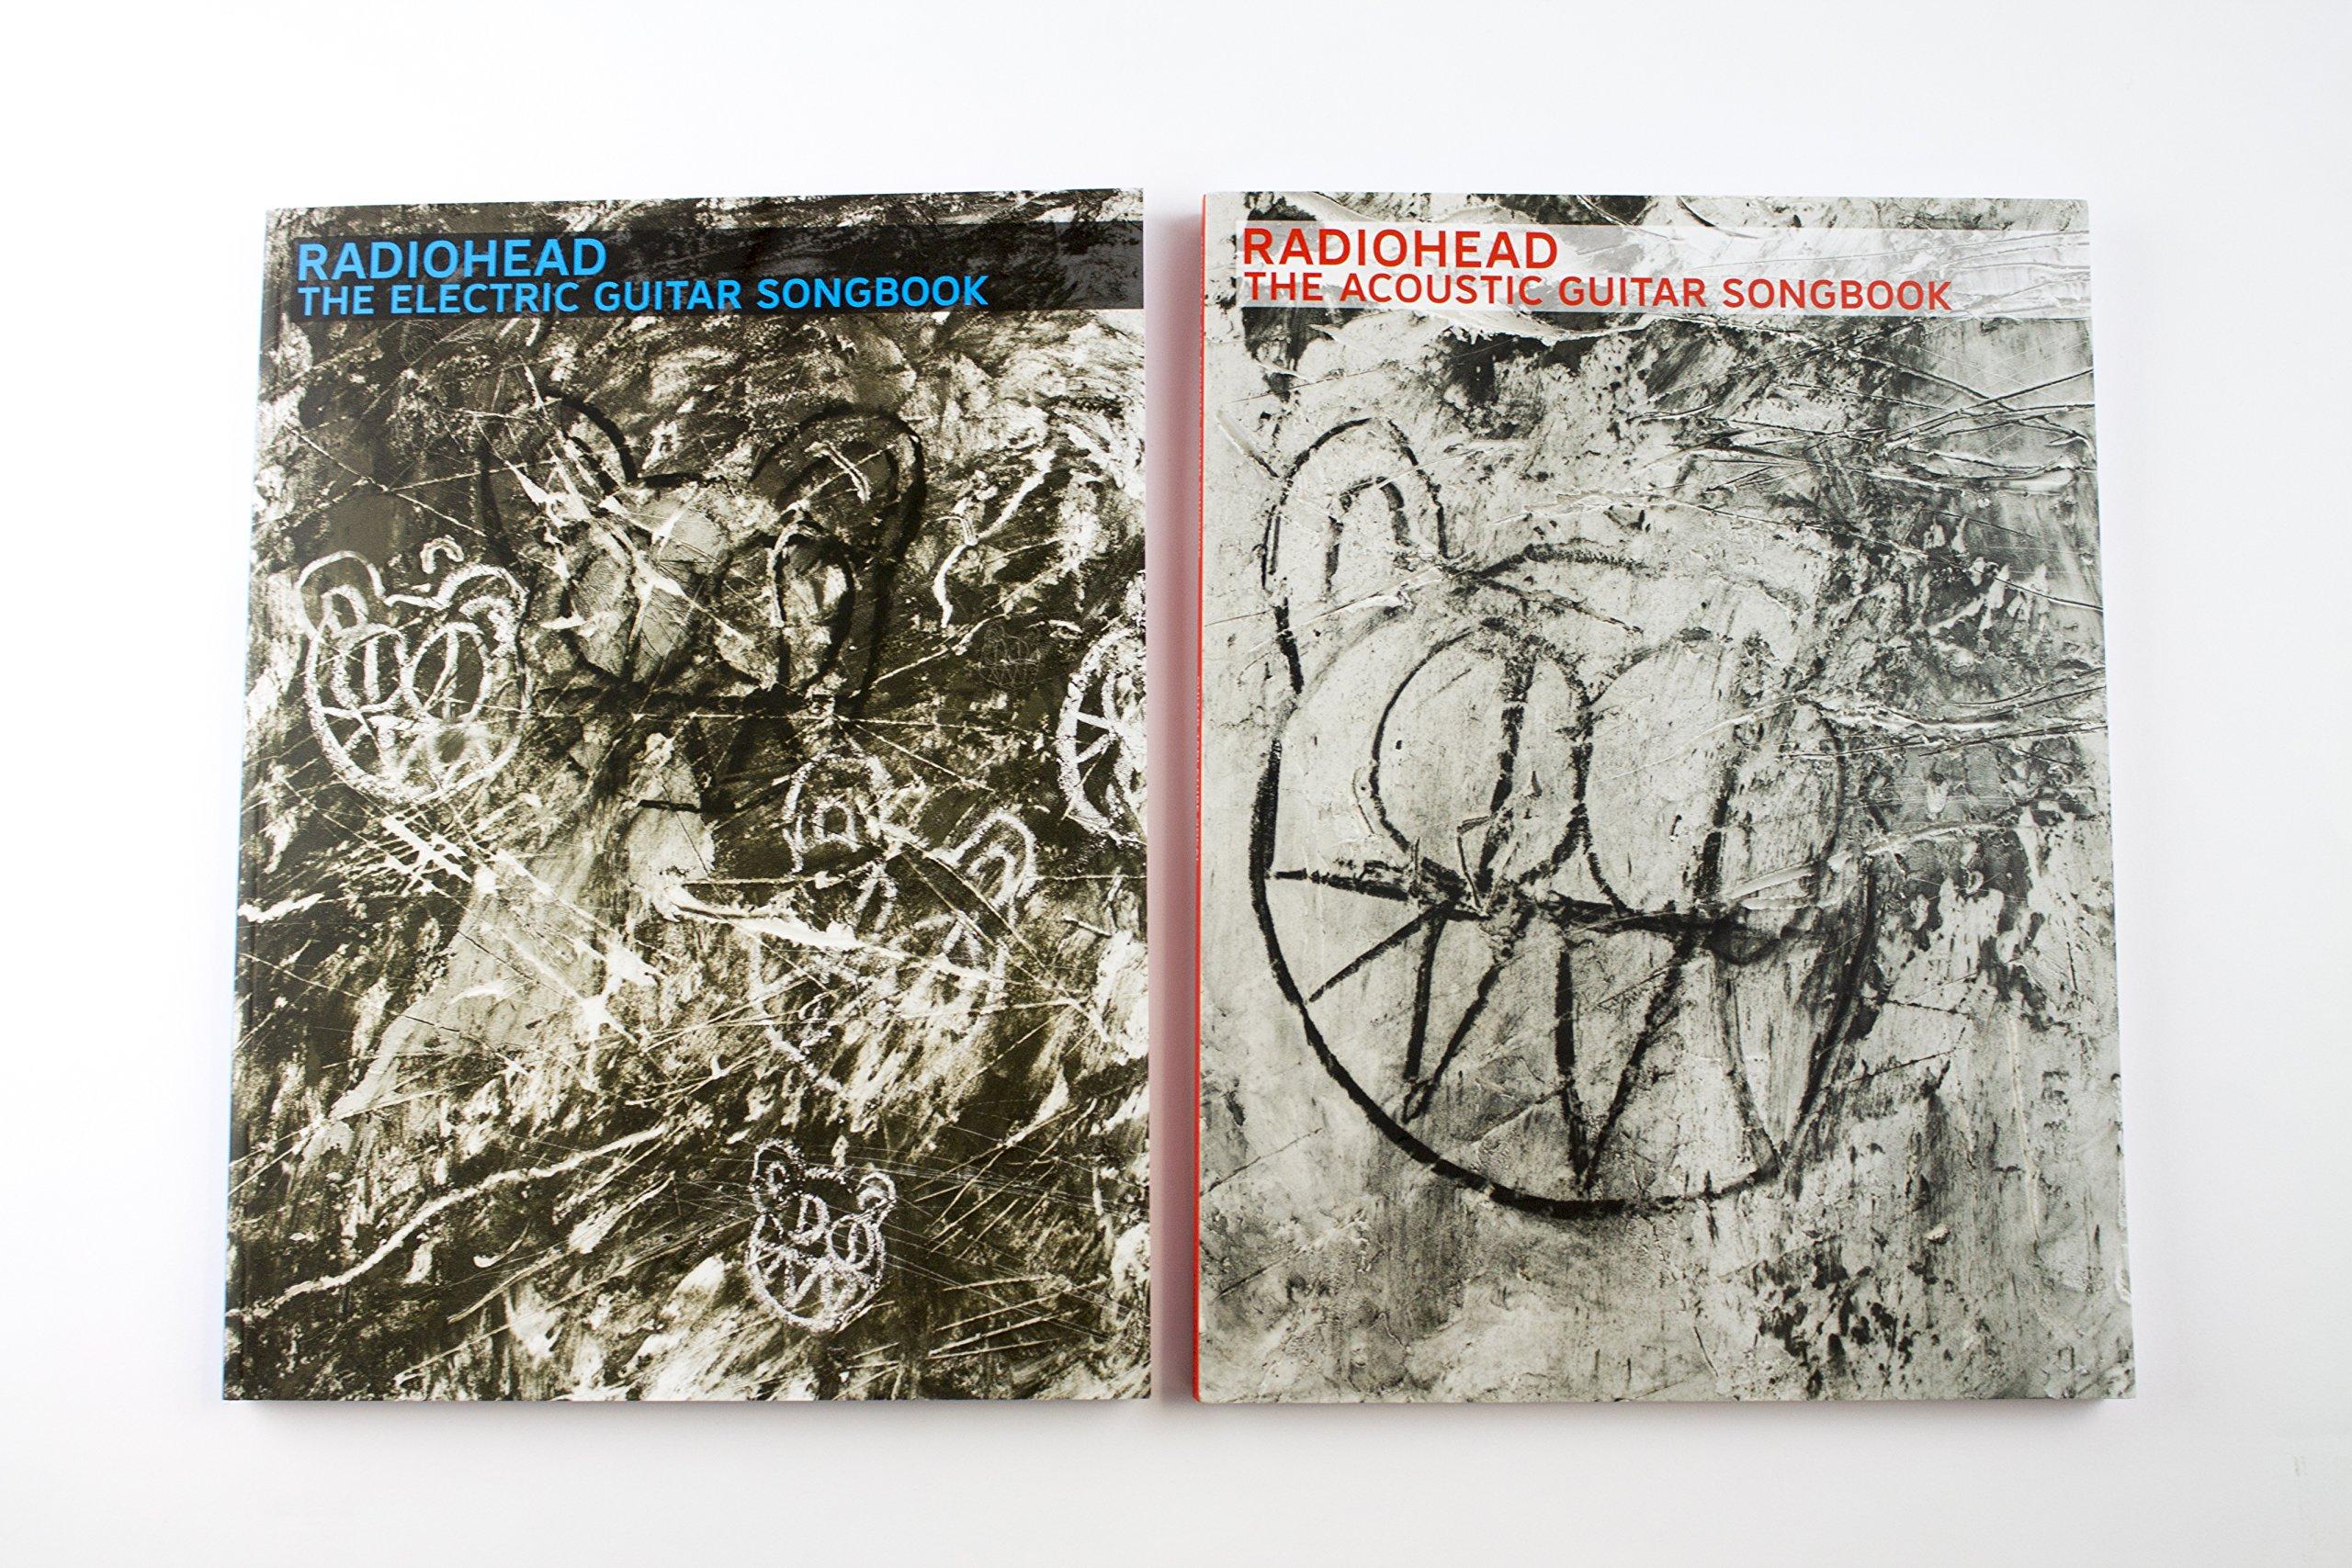 Radiohead The Acoustic Guitar Songbook Amazoncouk Radiohead Books